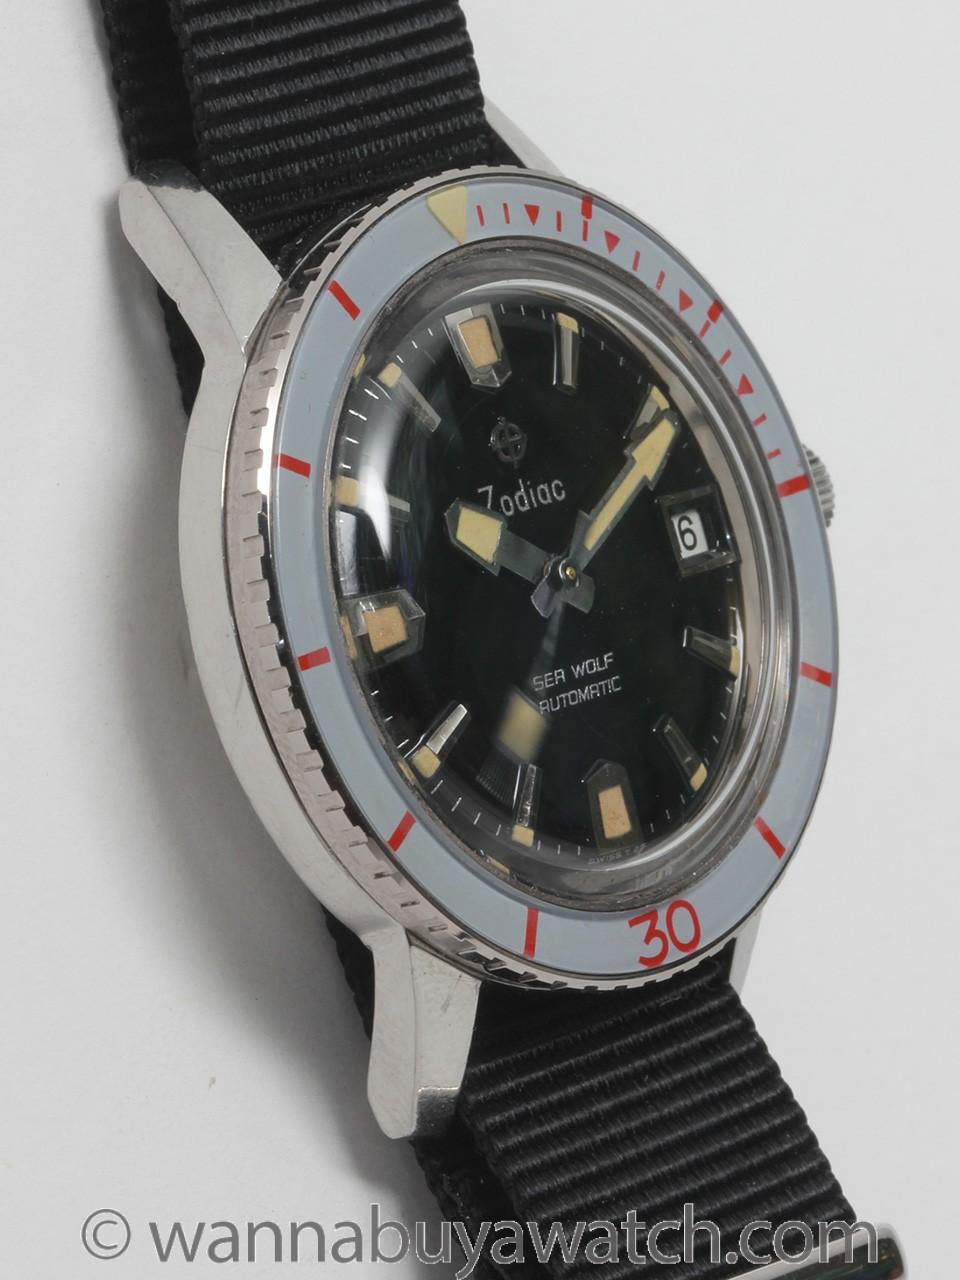 Zodiac SS Seawolf circa 1960's